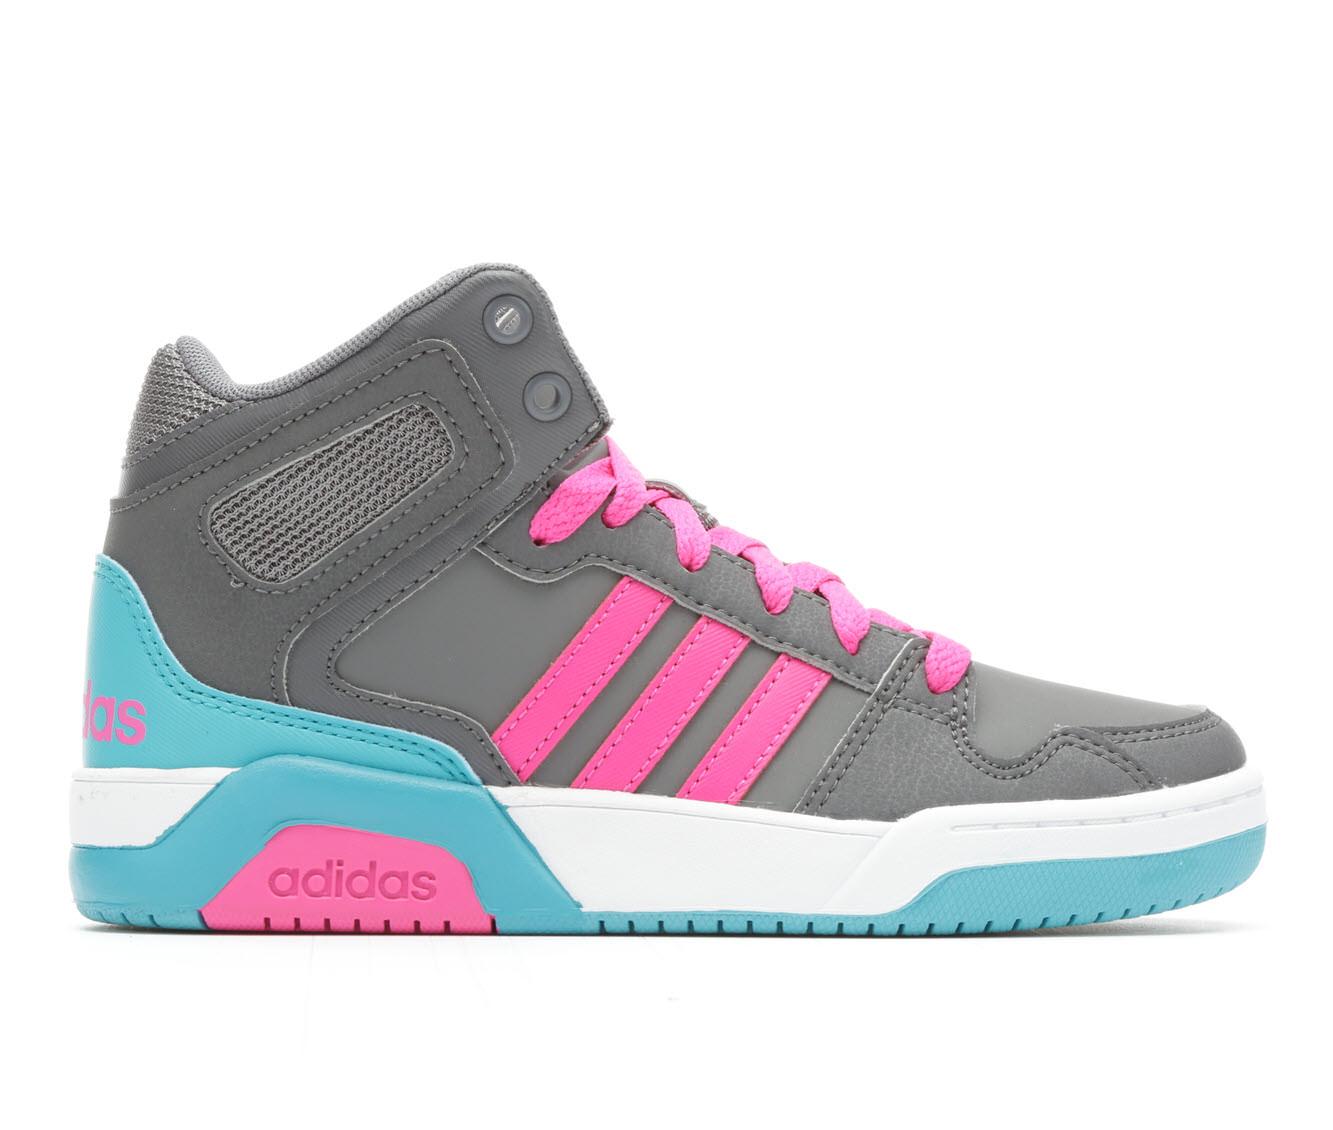 Girls' Adidas BB9TIS Mid K G Basketball Shoes (Grey)